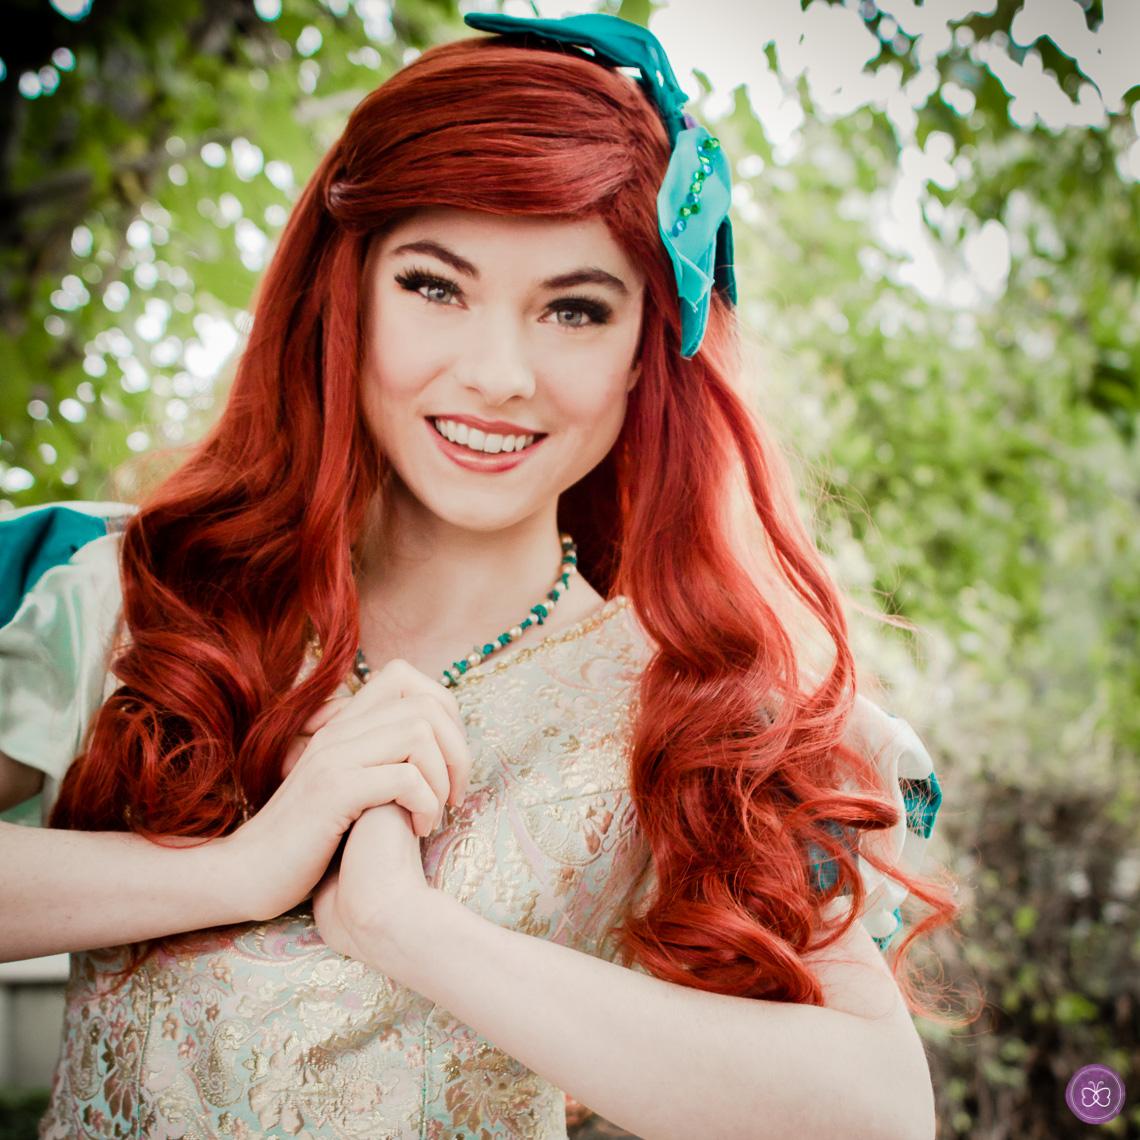 Princess Ariel character Los Angeles